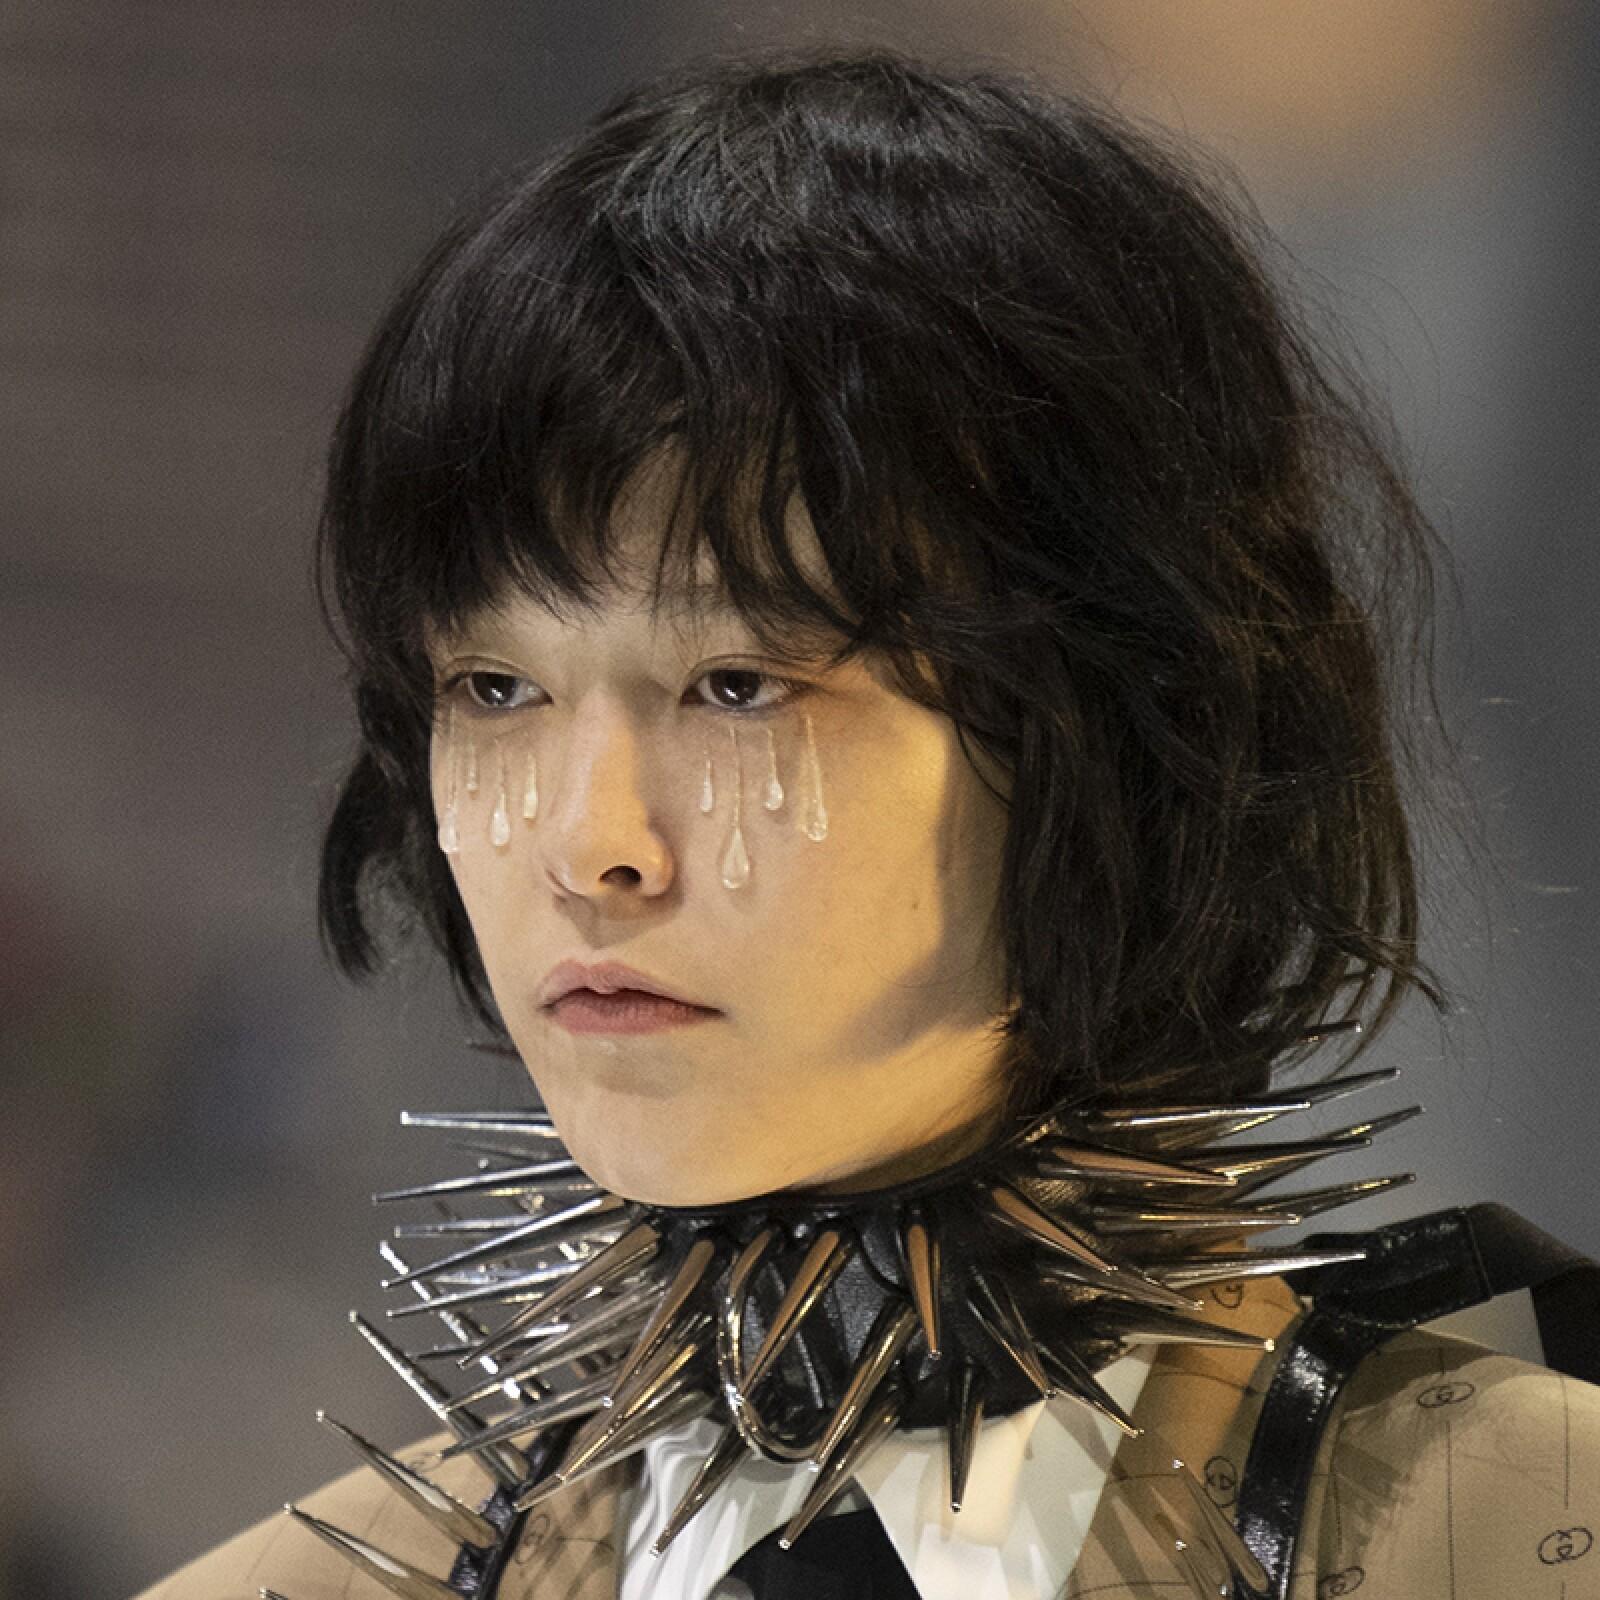 MFW-Milan-Fashion-Week-Beauty-Looks-Belleza-Pasarelas-Gucci